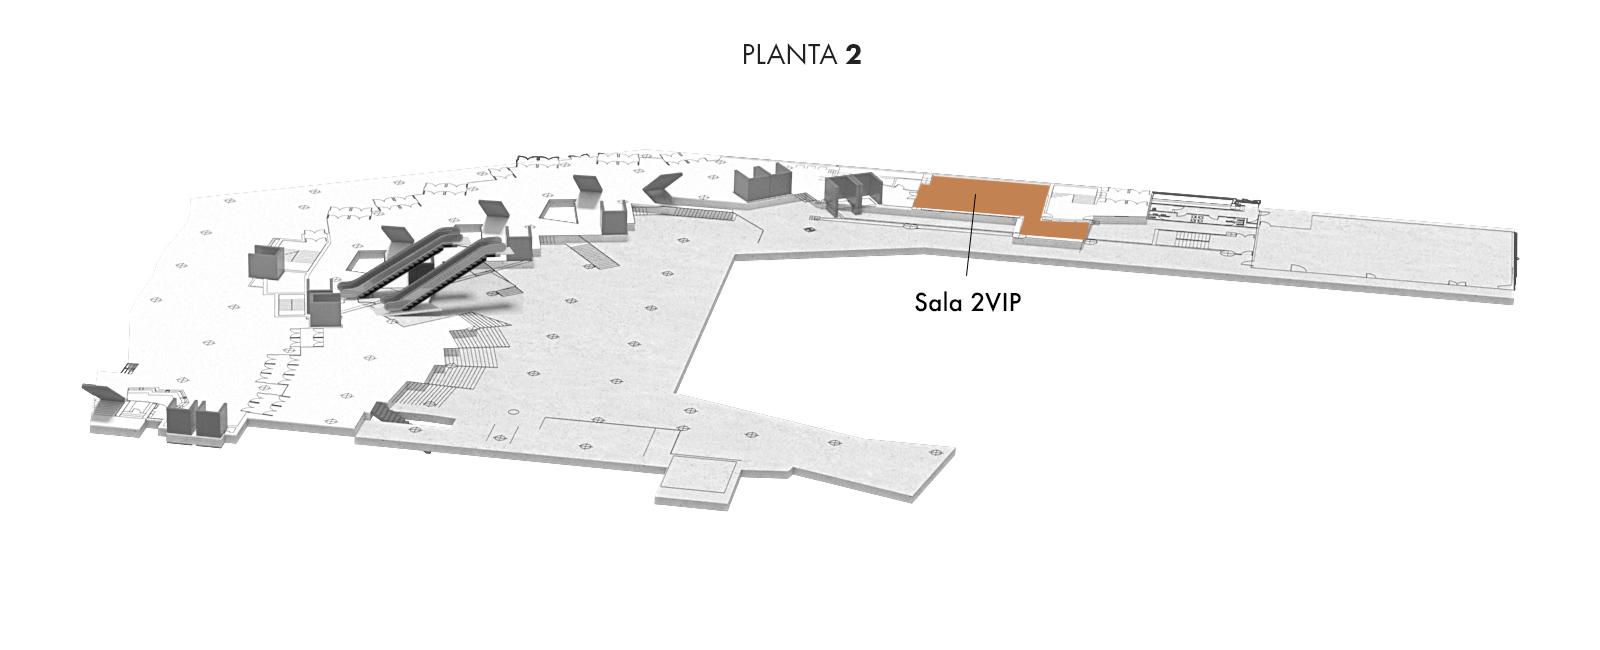 Sala 2VIP, Planta 2 | Palacio Euskalduna Jauregia